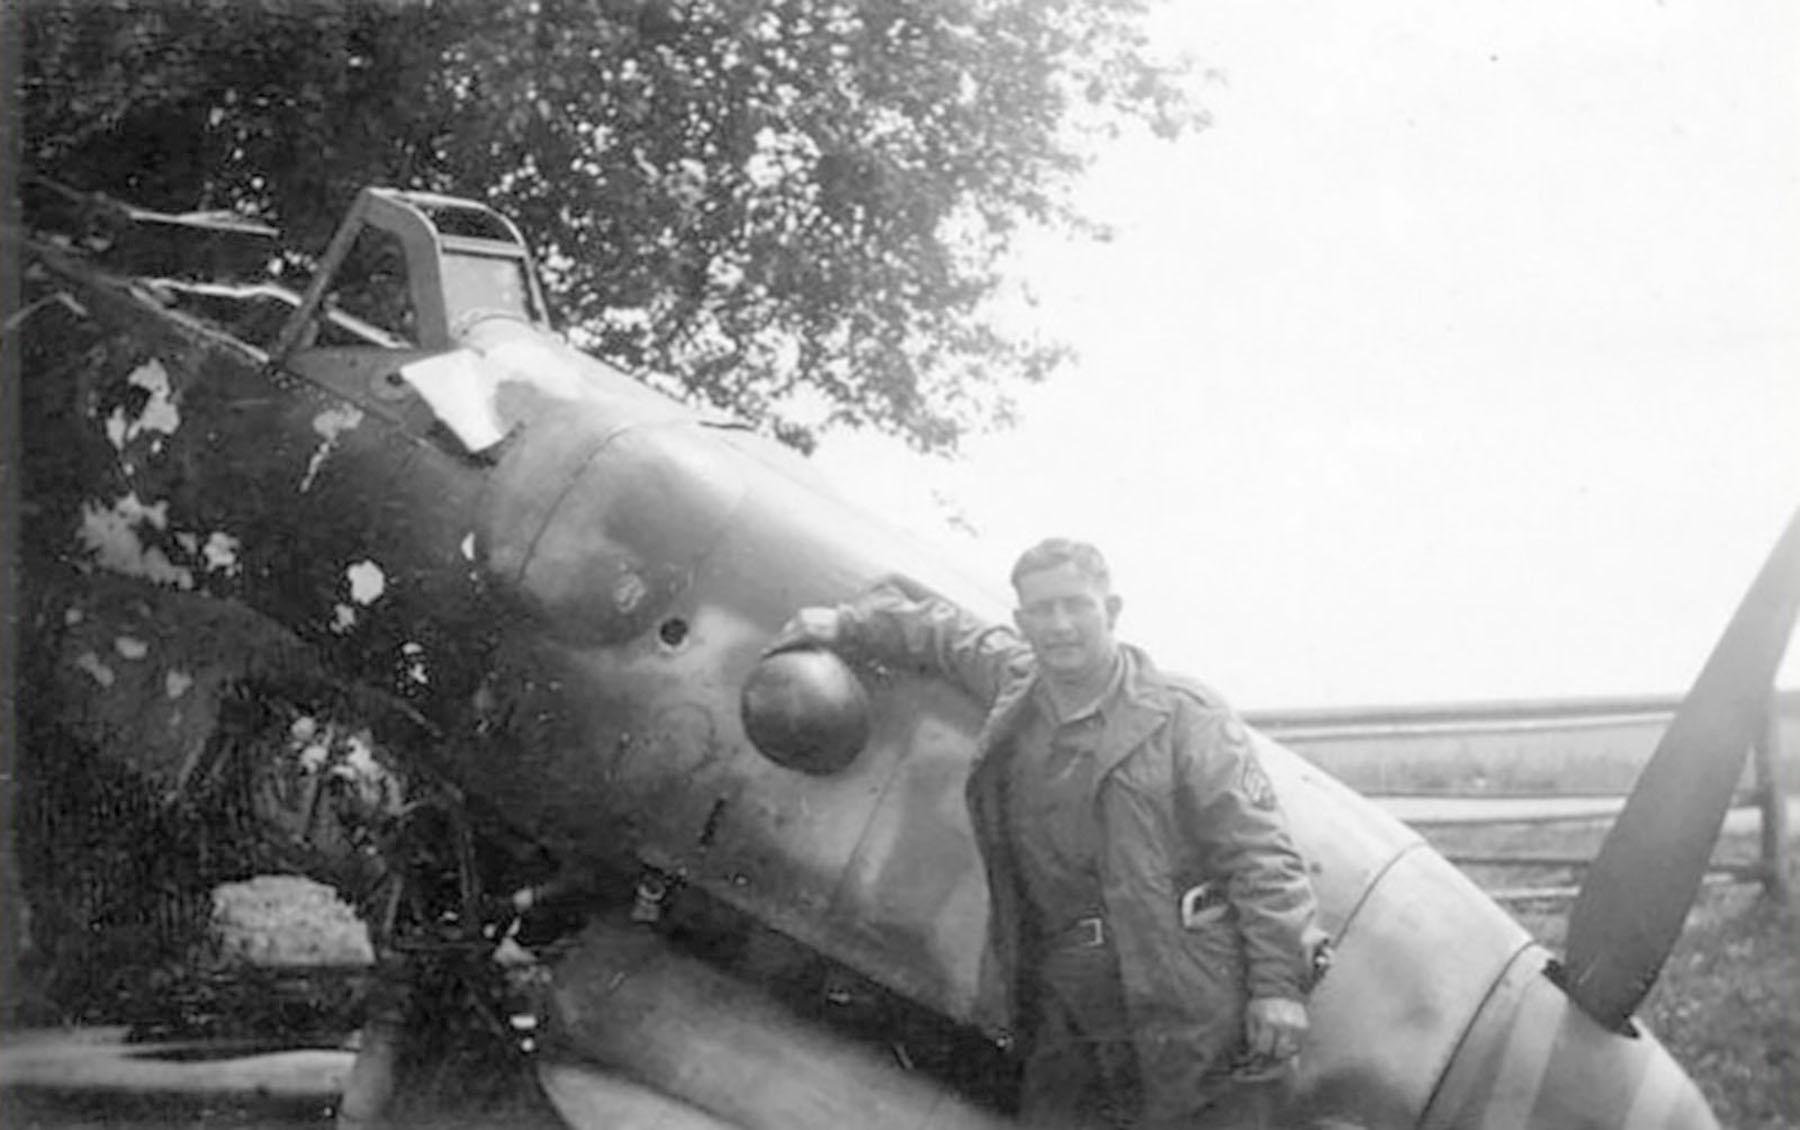 Messerschmitt Bf 109G12 abandoned airframe unknown unit Lt Borelli 1945 02